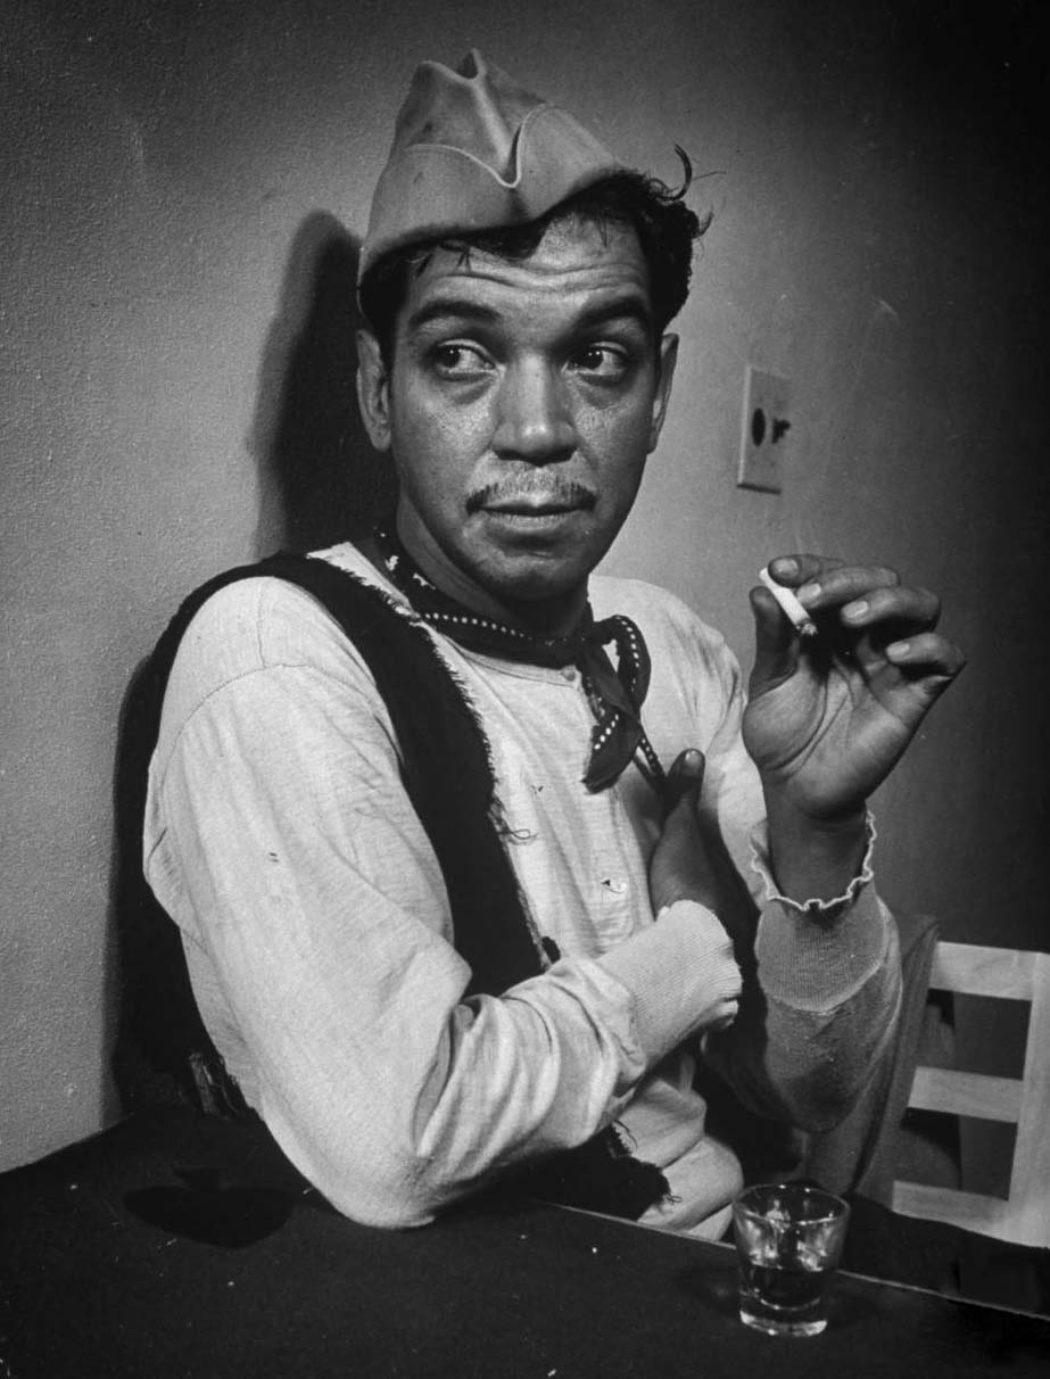 Gran admirador de Cantinflas